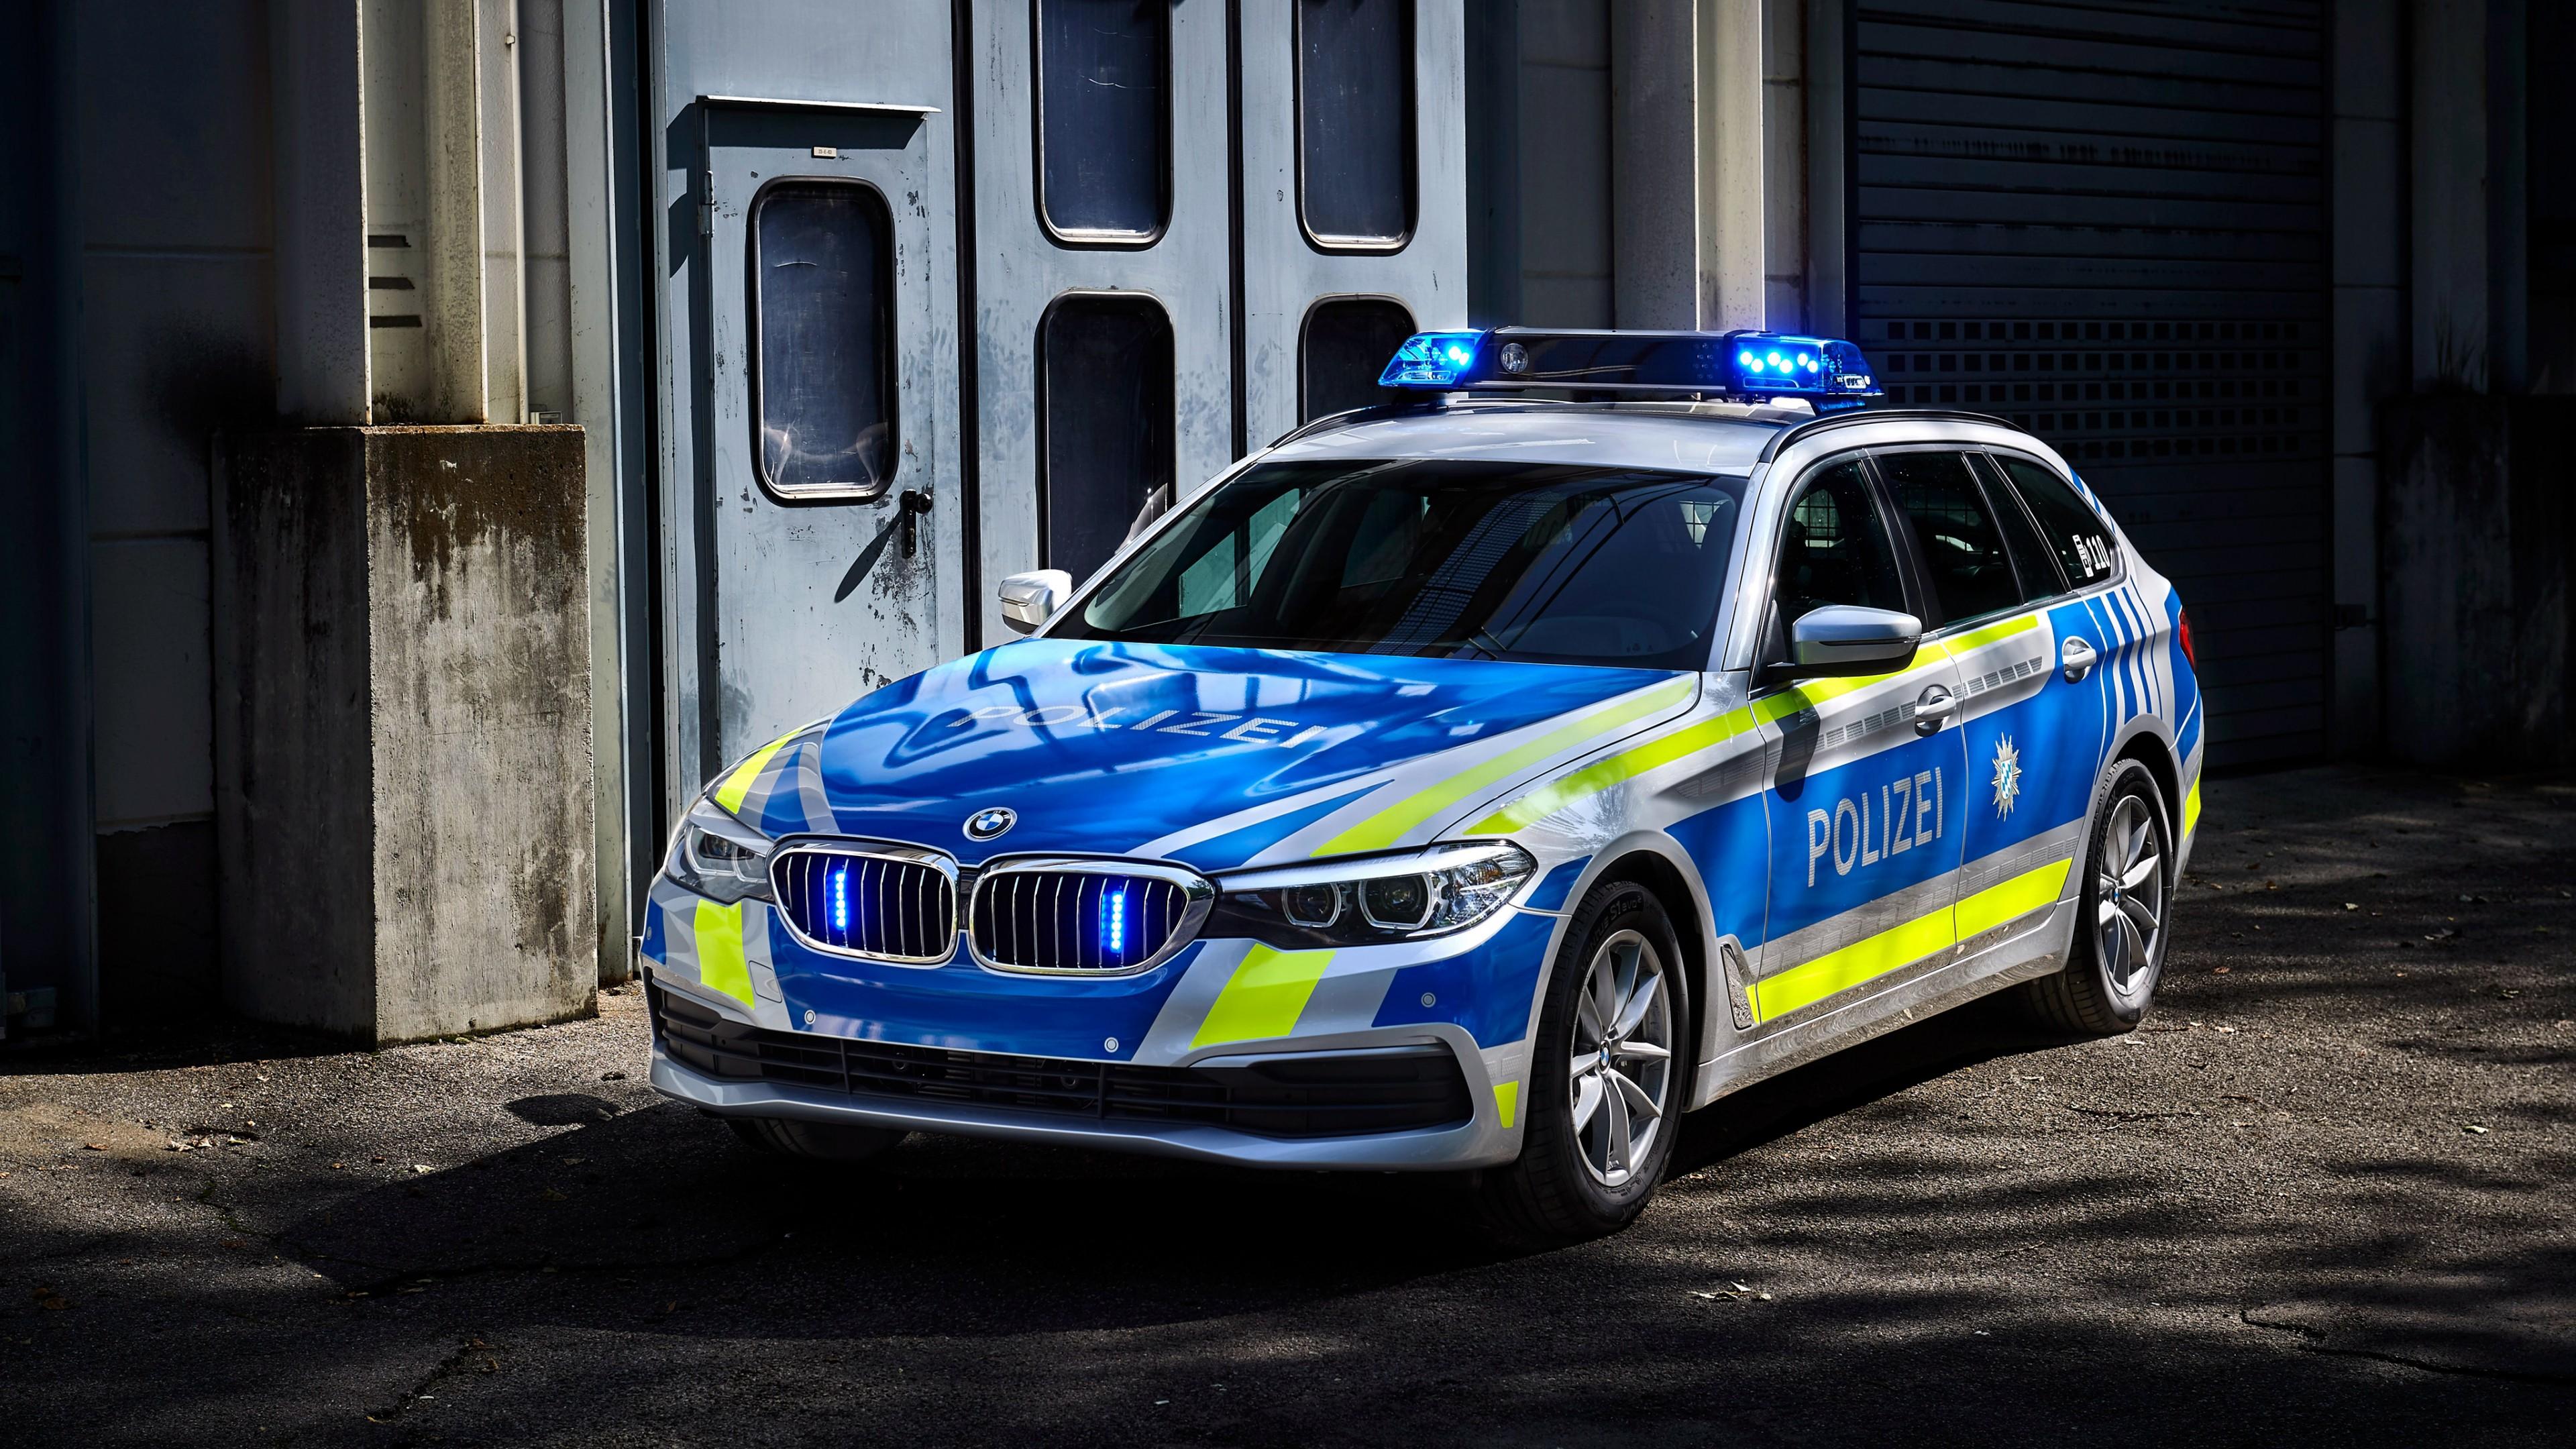 2017 Bmw 530d Xdrive Touring Polizei 4k Wallpaper Hd Car Wallpapers Id 8380